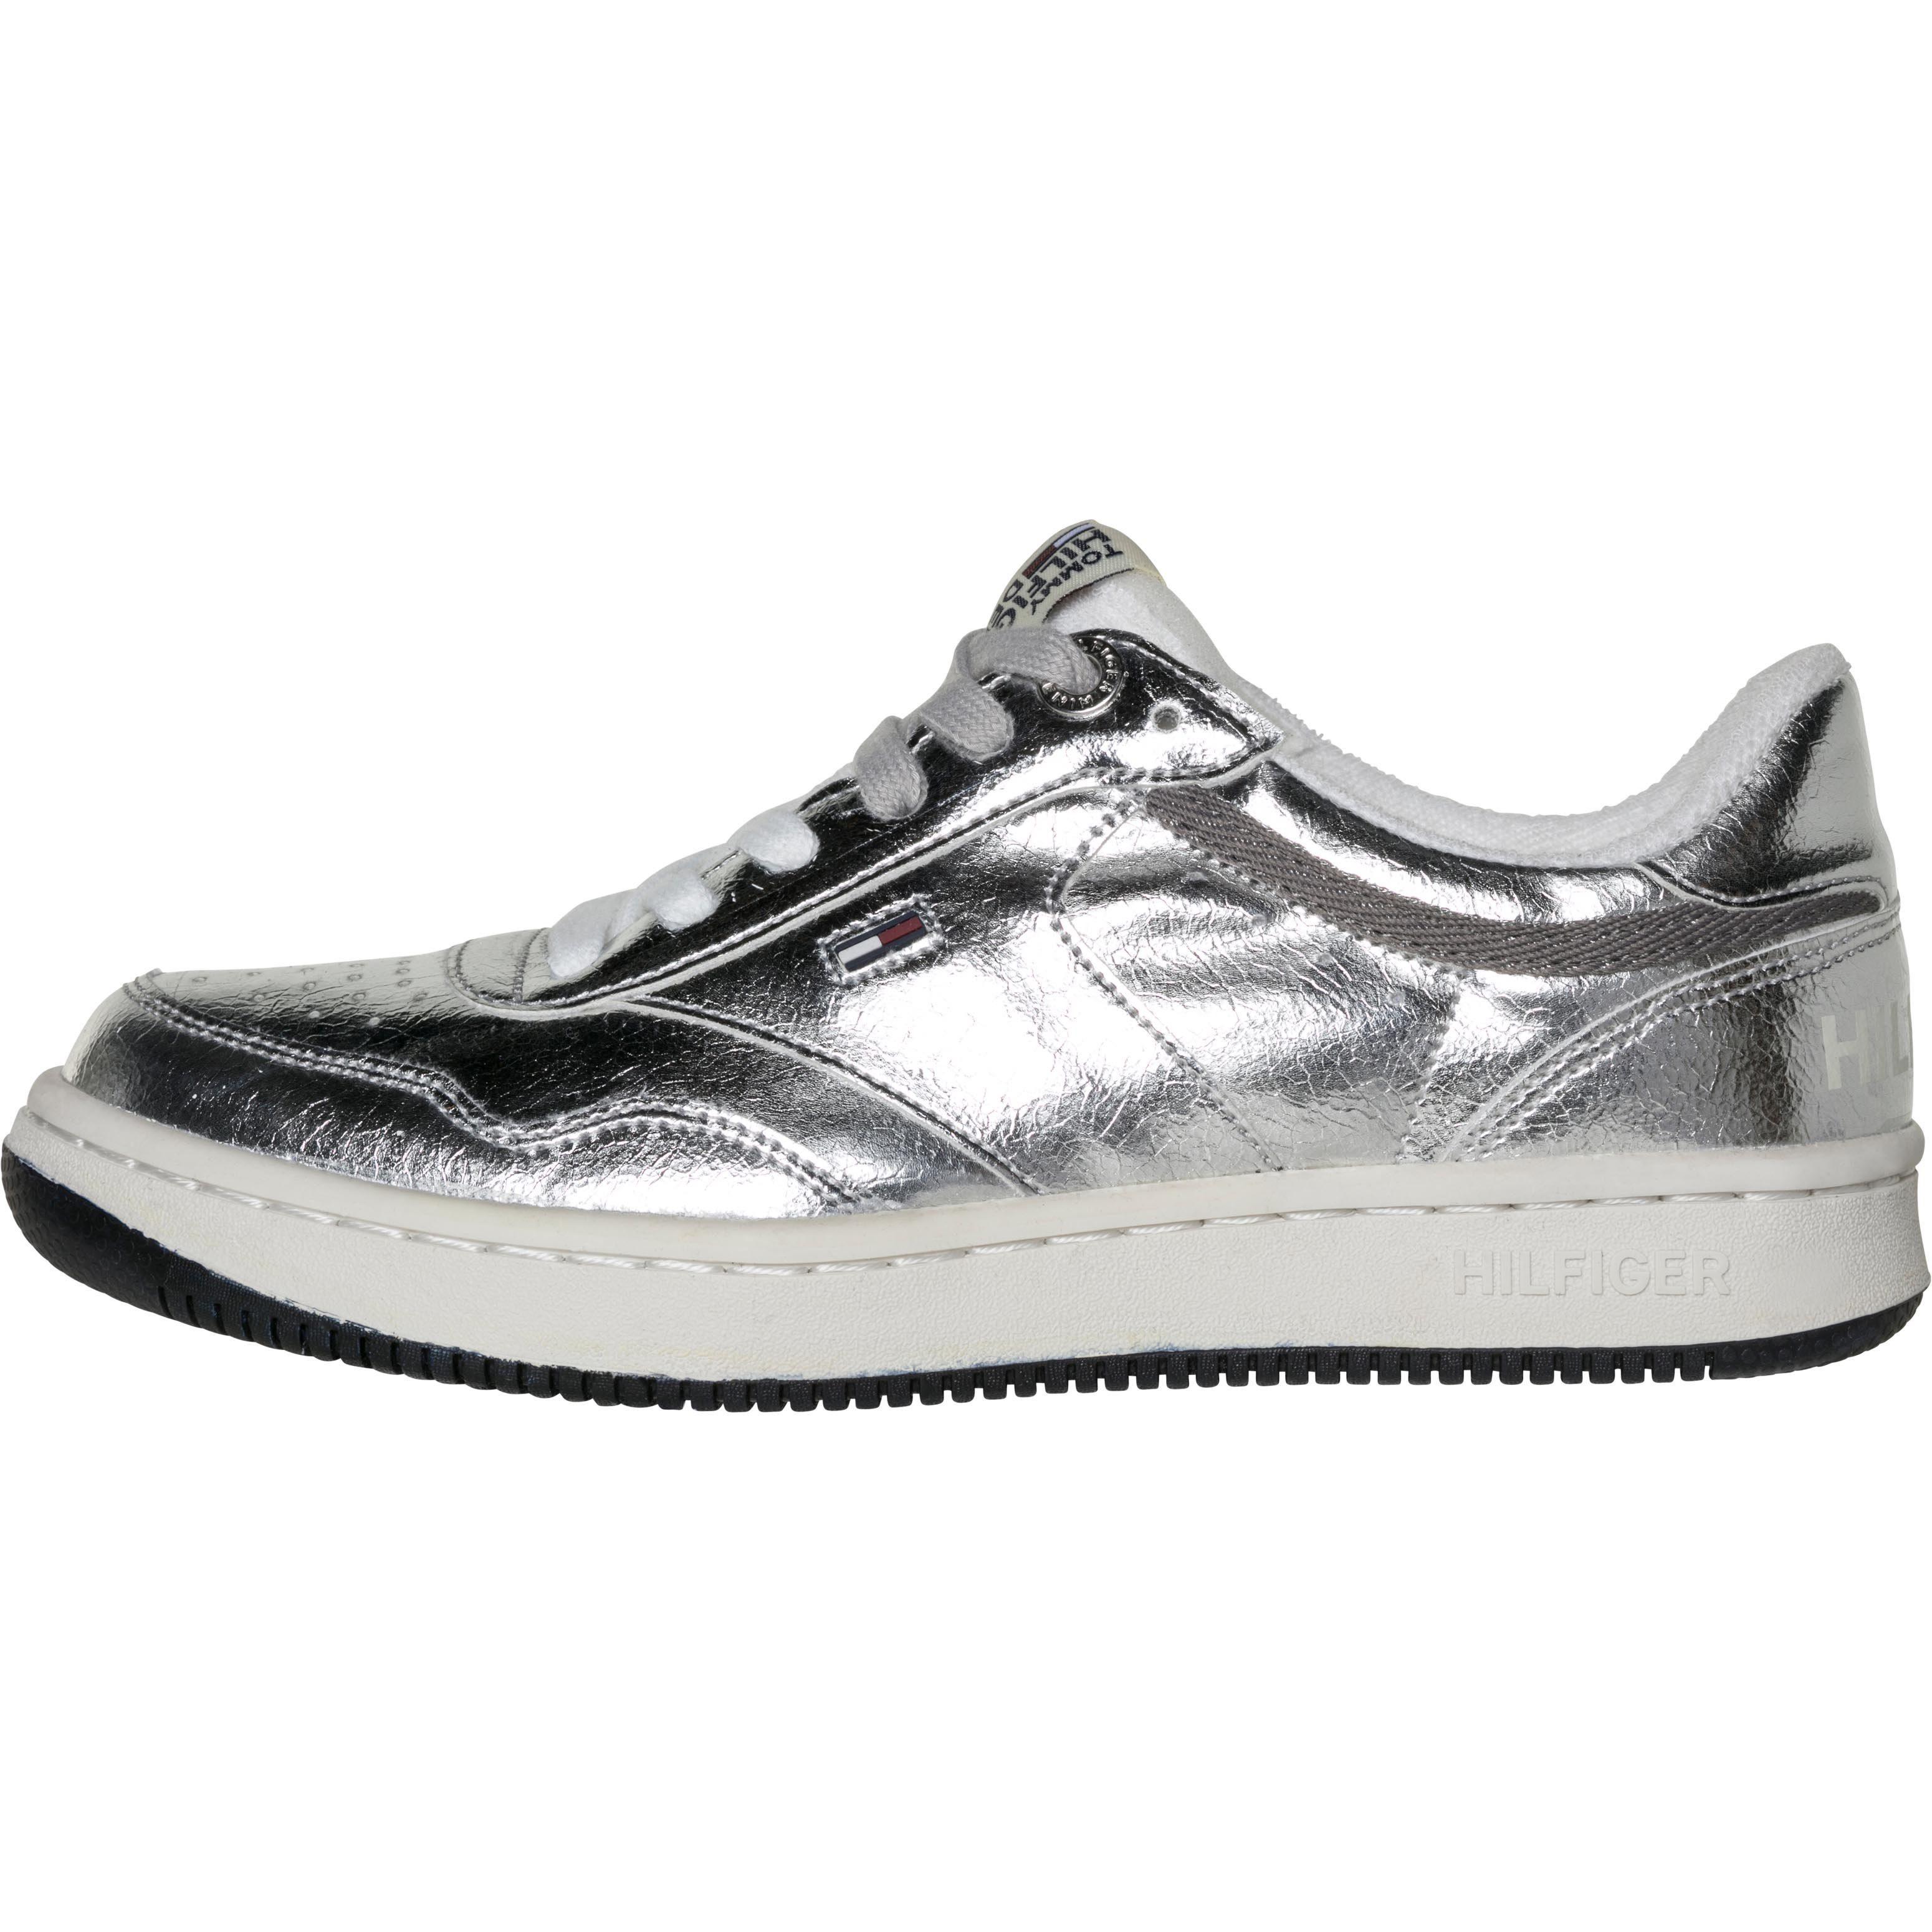 Tommy Hilfiger Sneaker WMNS J1385UMP 1Z1 kaufen  SILVER